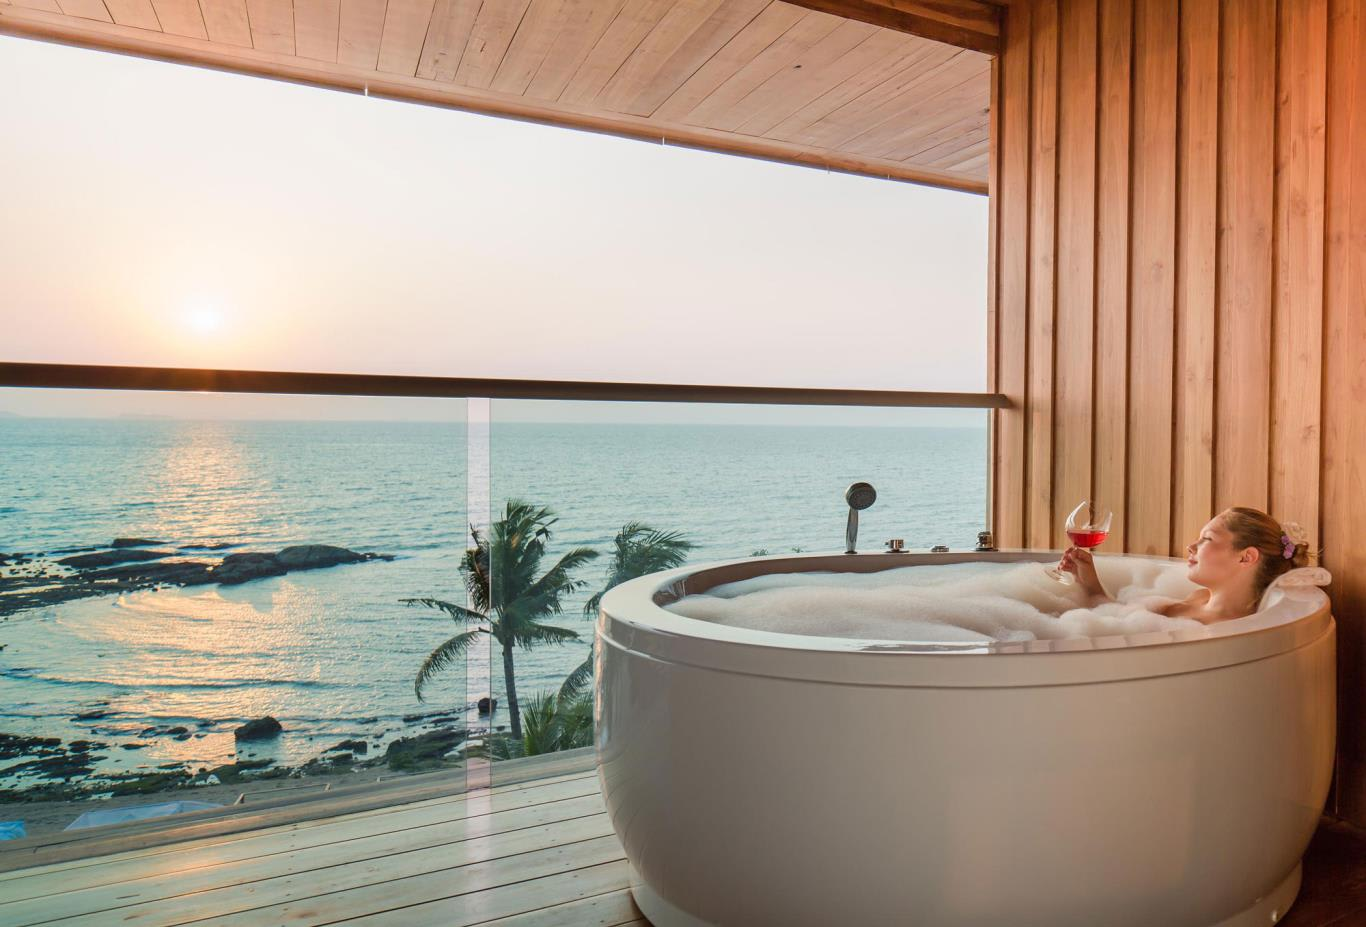 Dara-Beachfront-bath-and-view